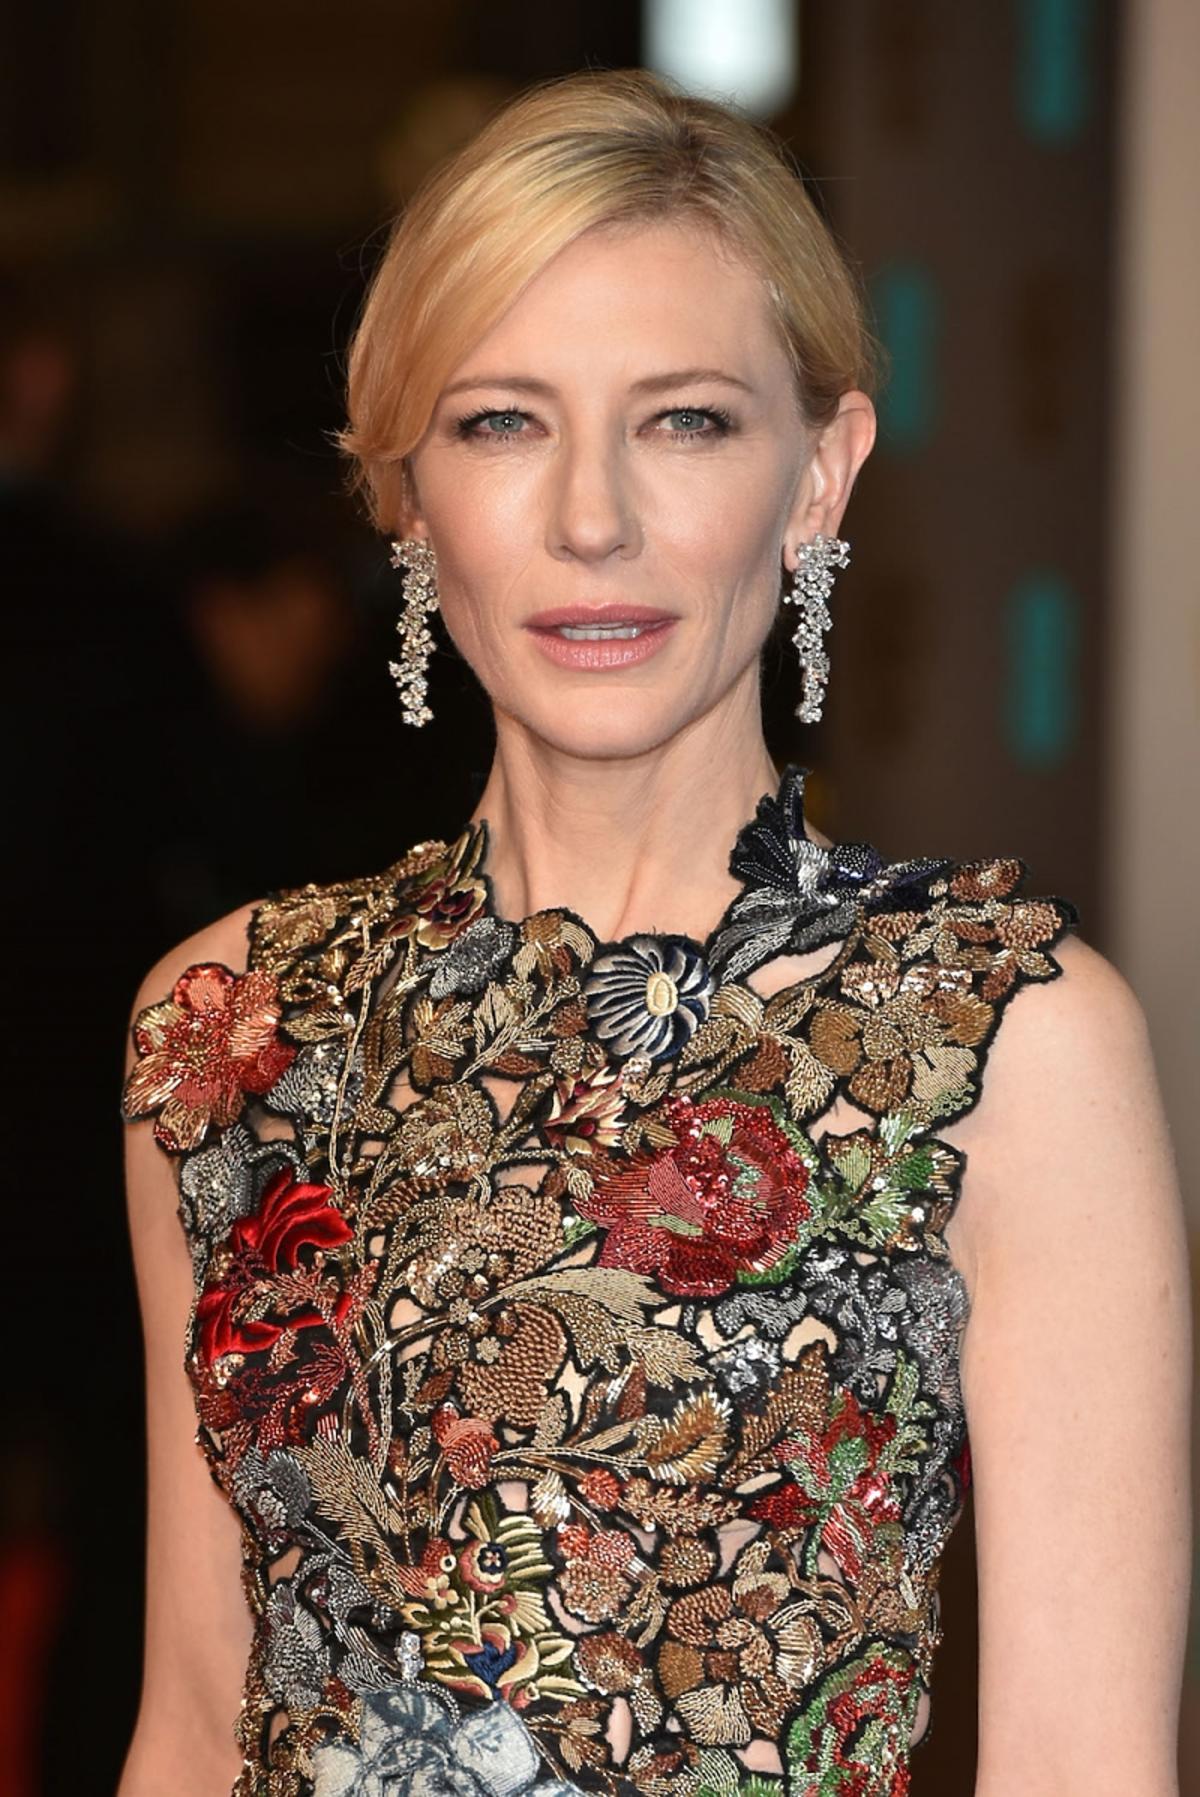 Cate Blanchett w sukni bogato zdobionej na górze